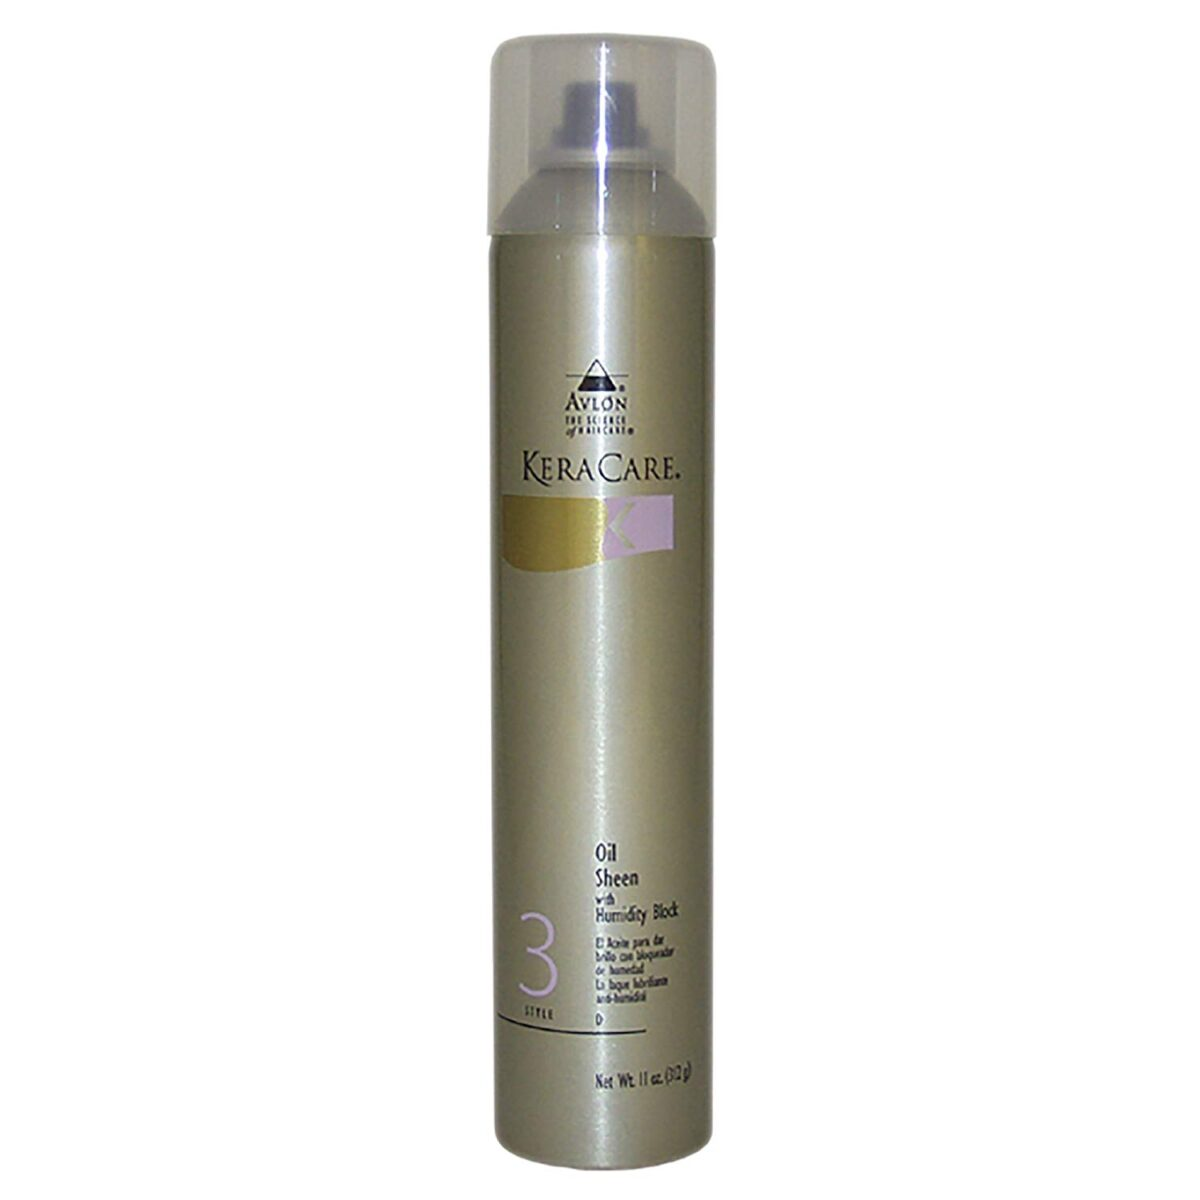 Buy Keracare Avlon Oil Sheen With Humidity Block, 10 Ounce